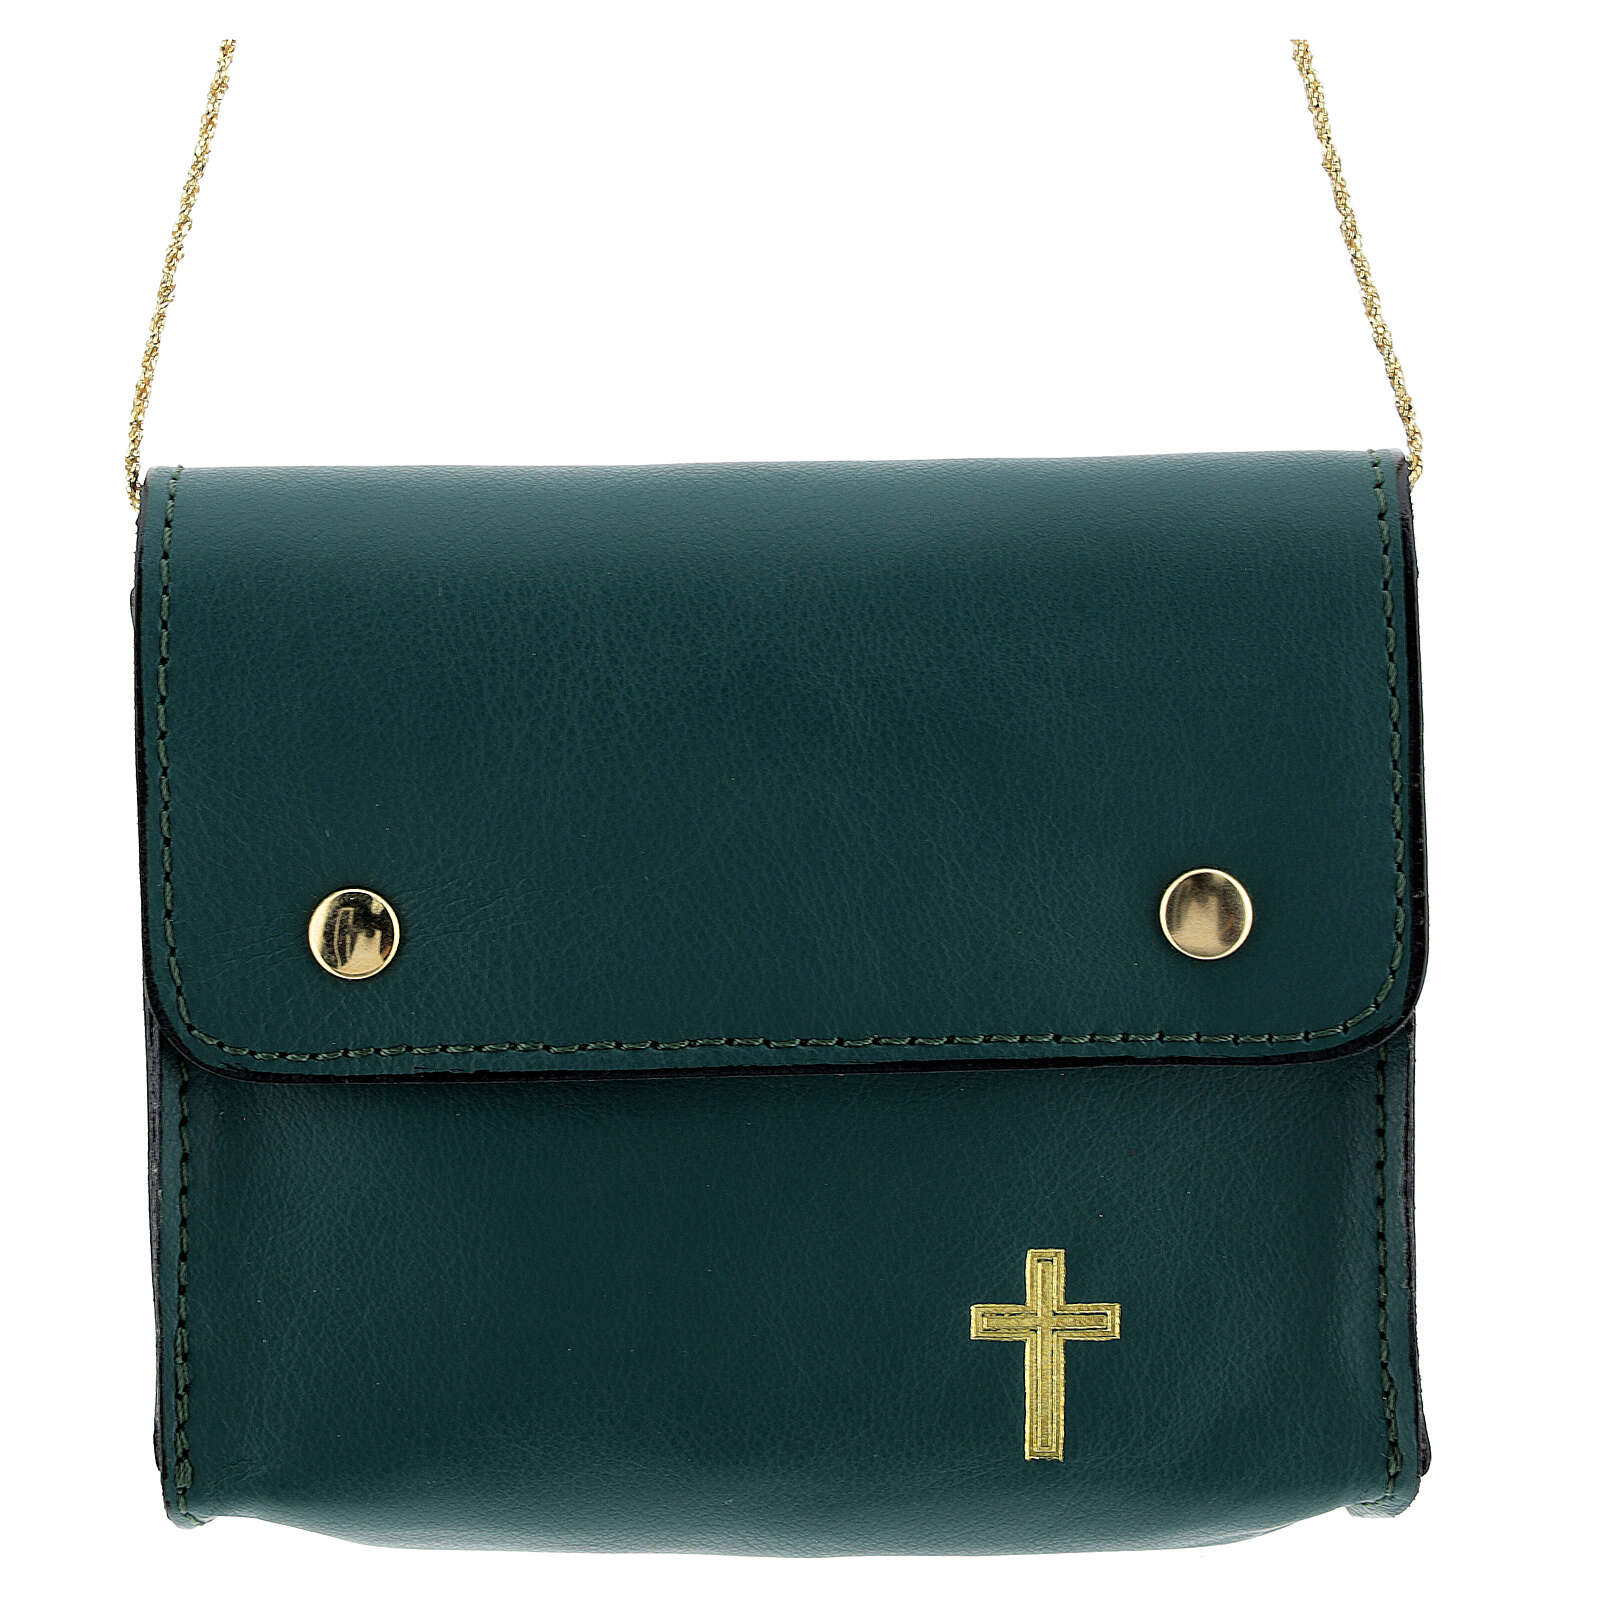 Paten bag 10x12 cm in green leather 4